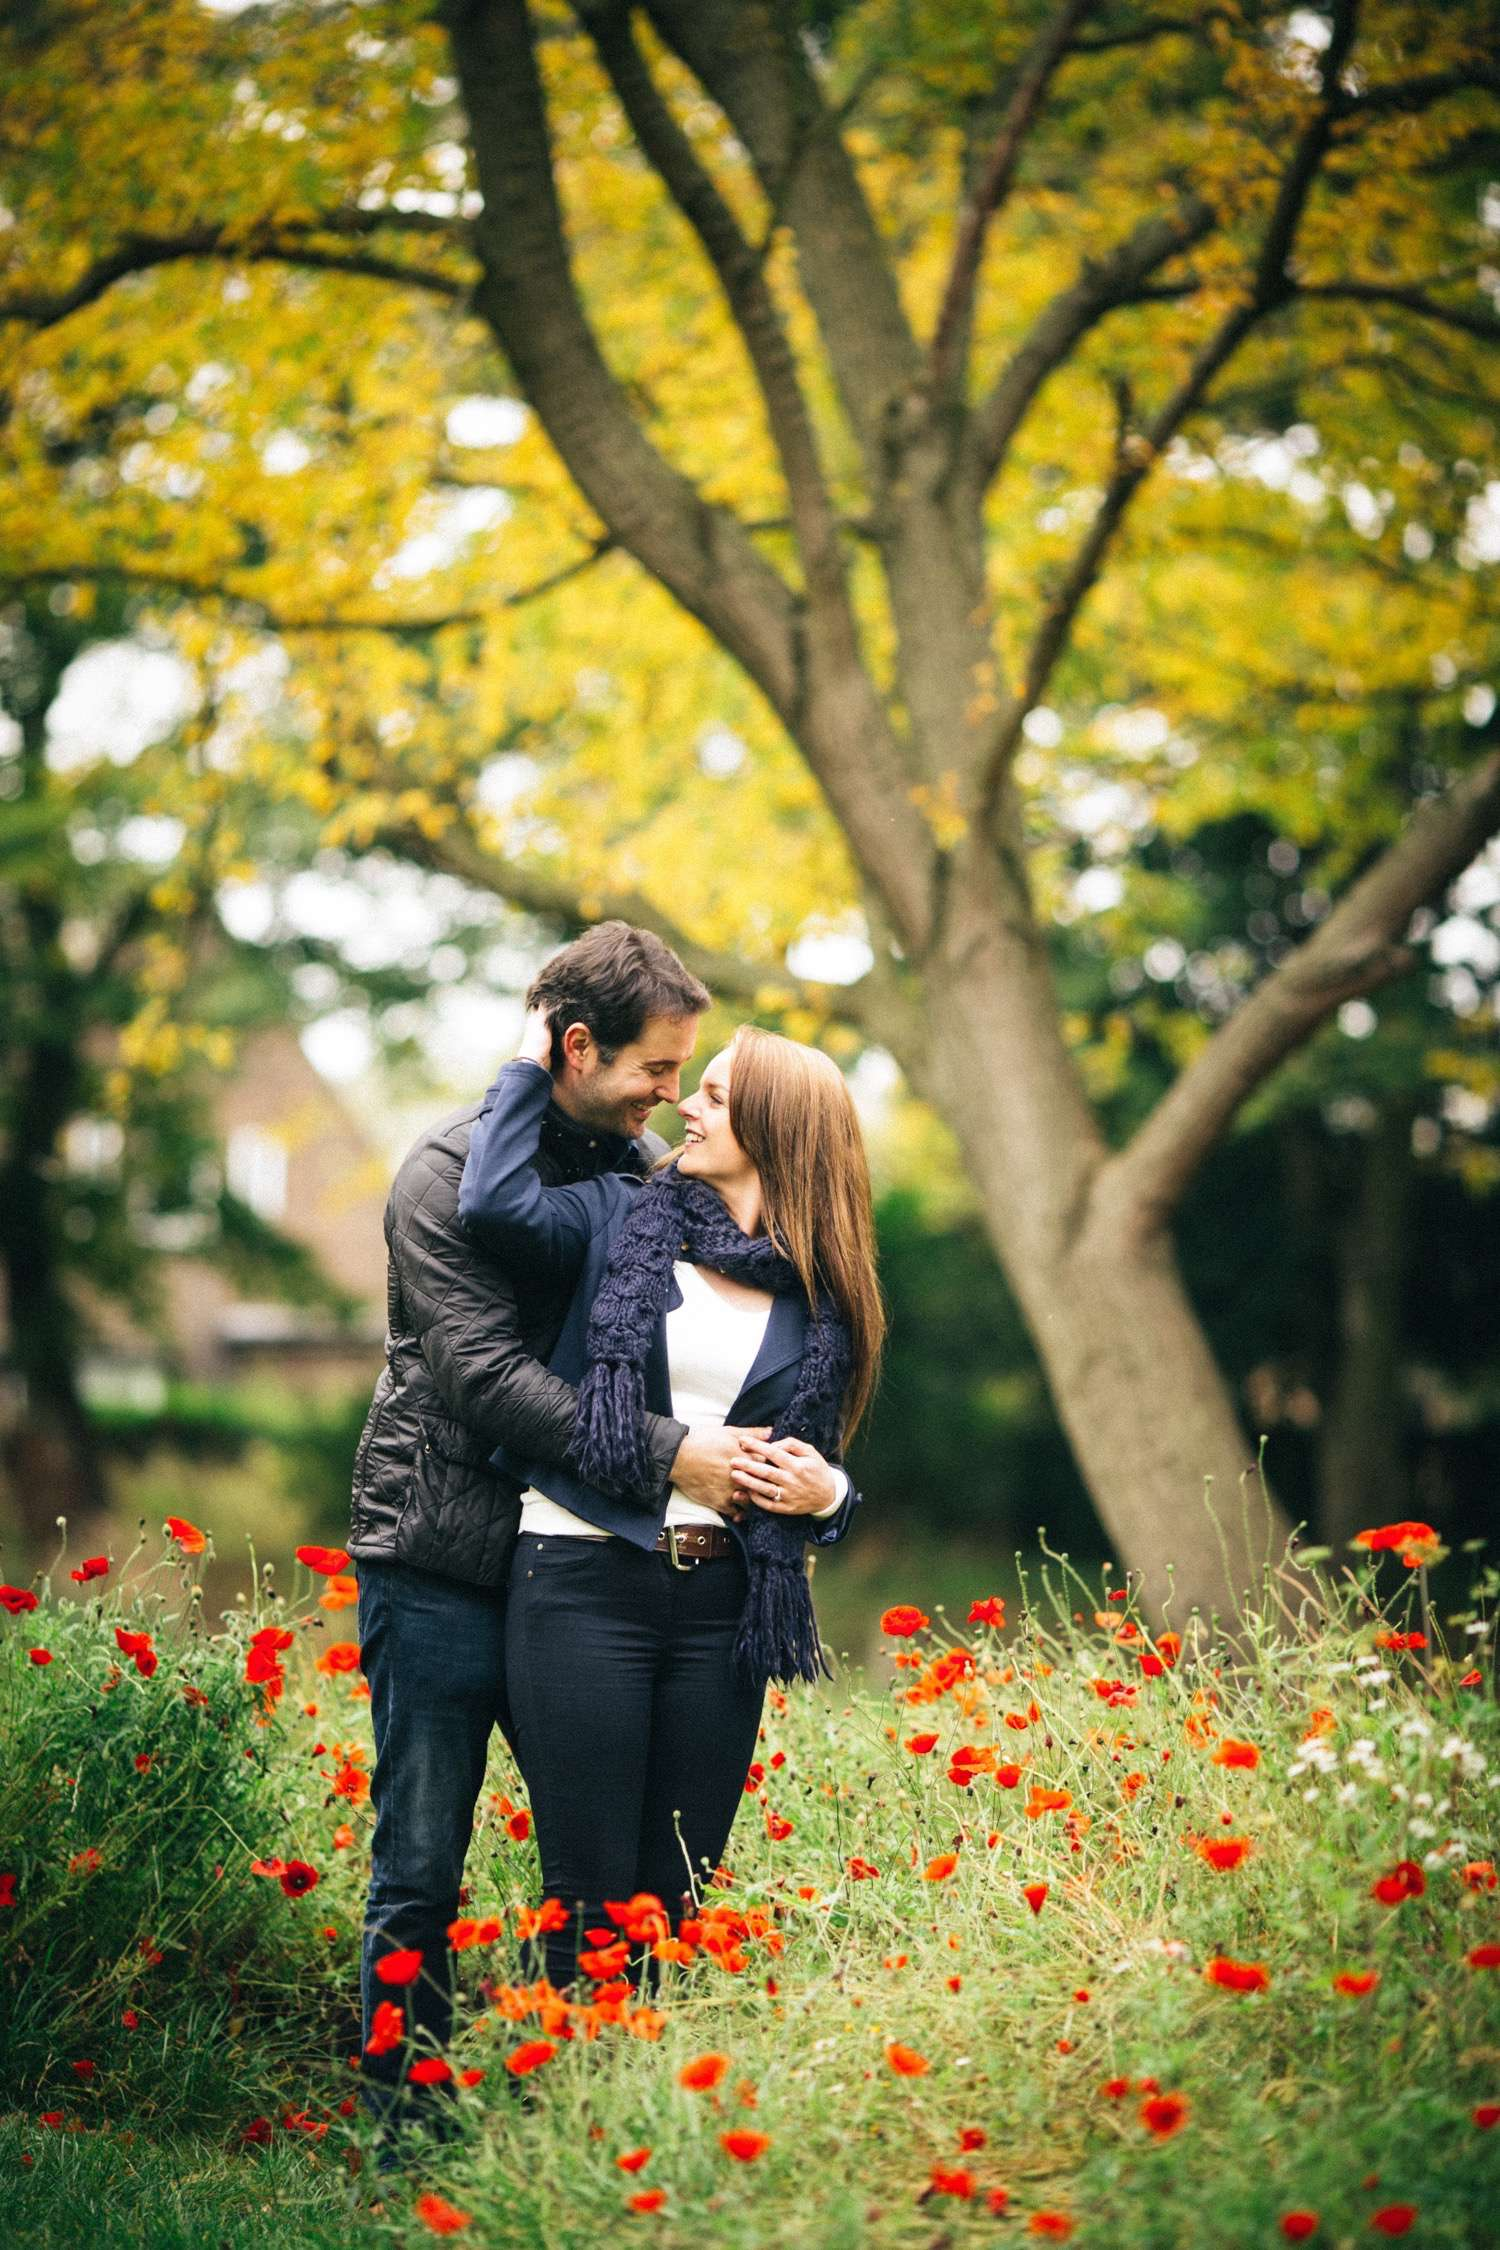 pre-wedding-photographer-engagment-shoot-photographer-darlington-31.jpg